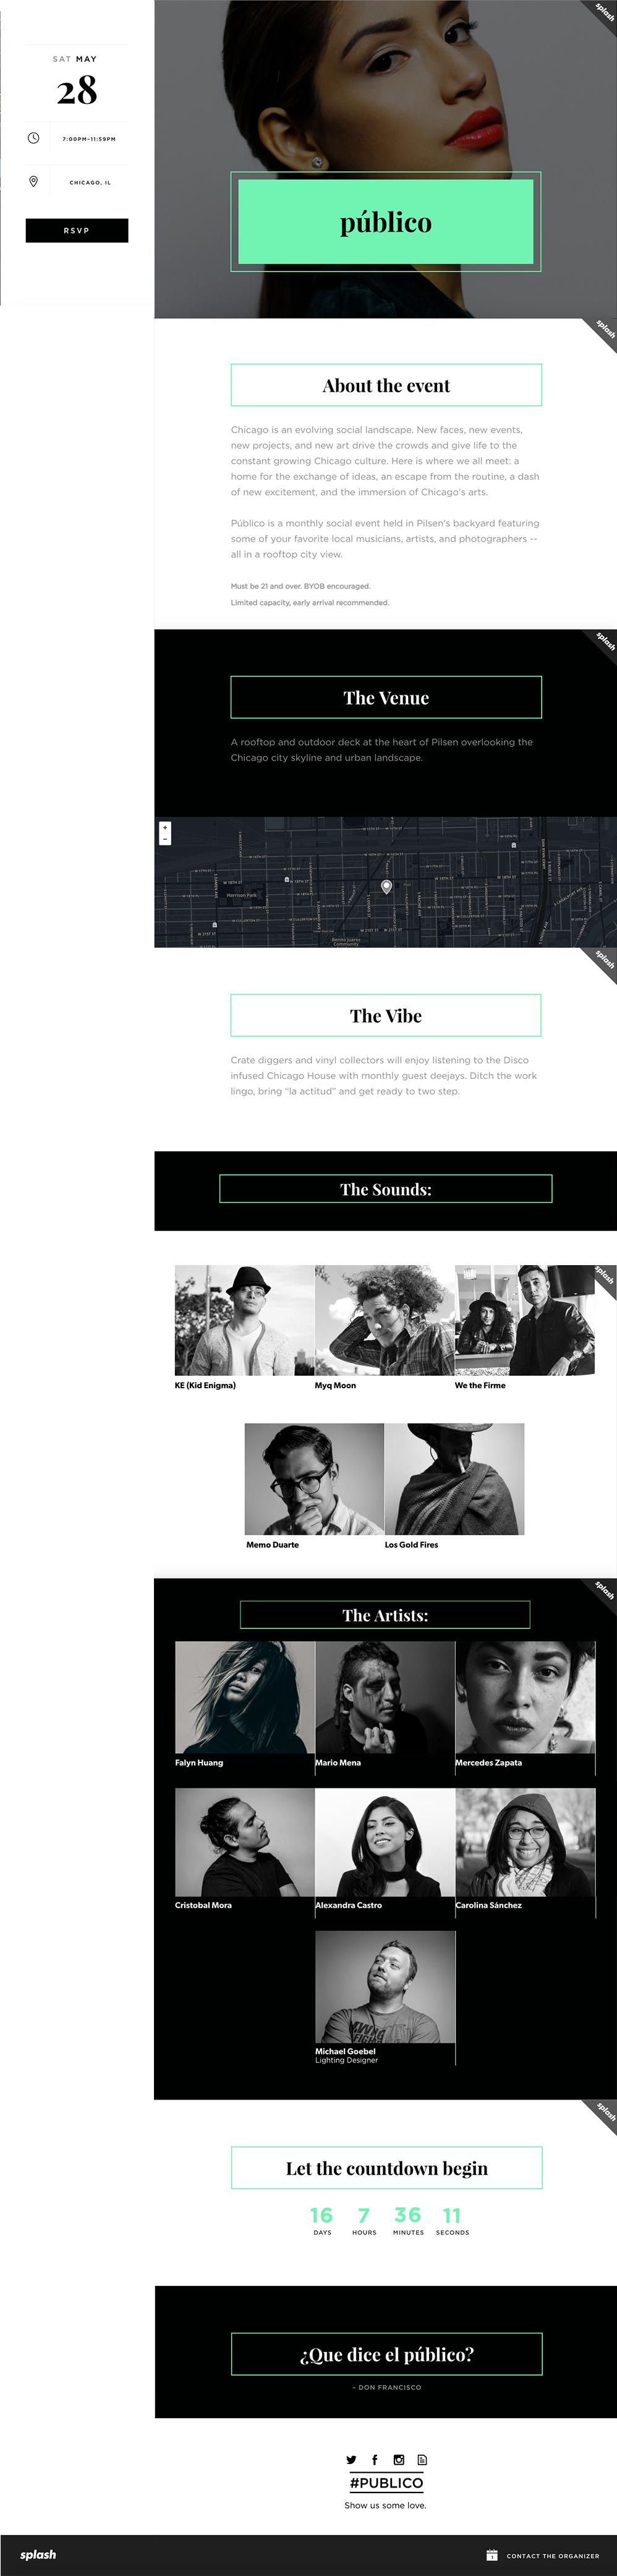 publico_website_layout